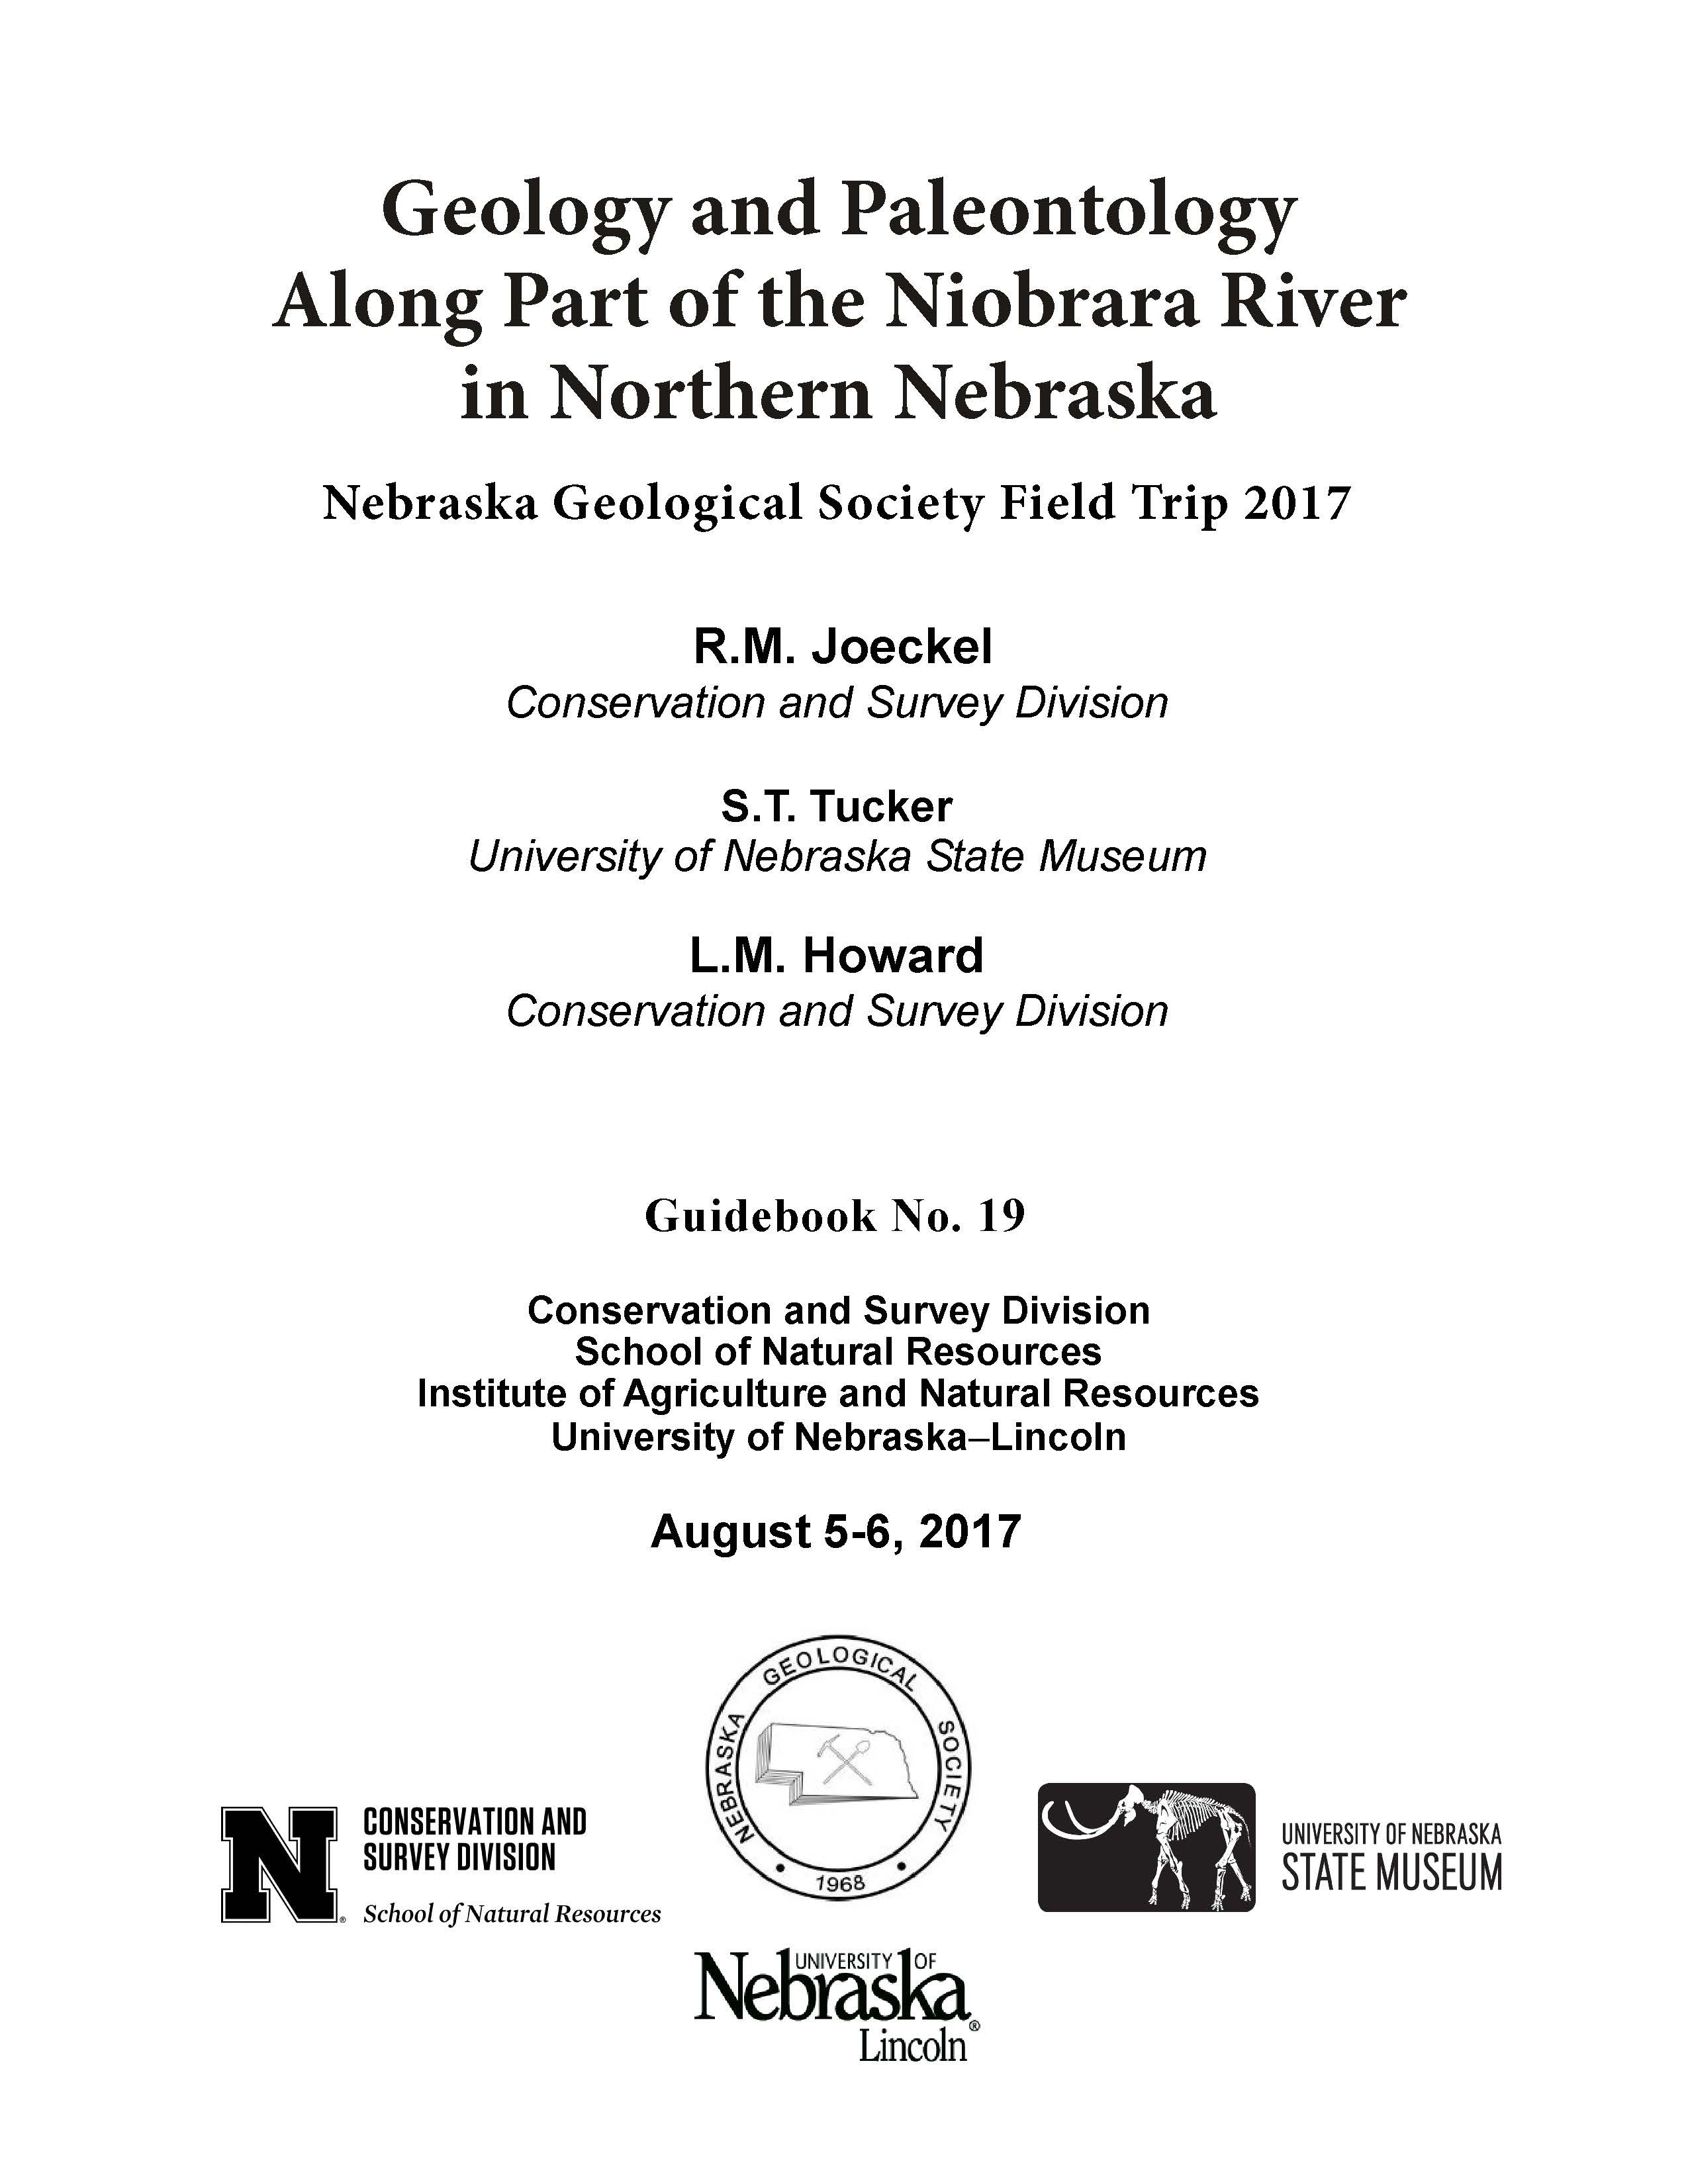 Geology and Paleontology Along Part of the Niobrara River in Northern Nebraska (GB-19)